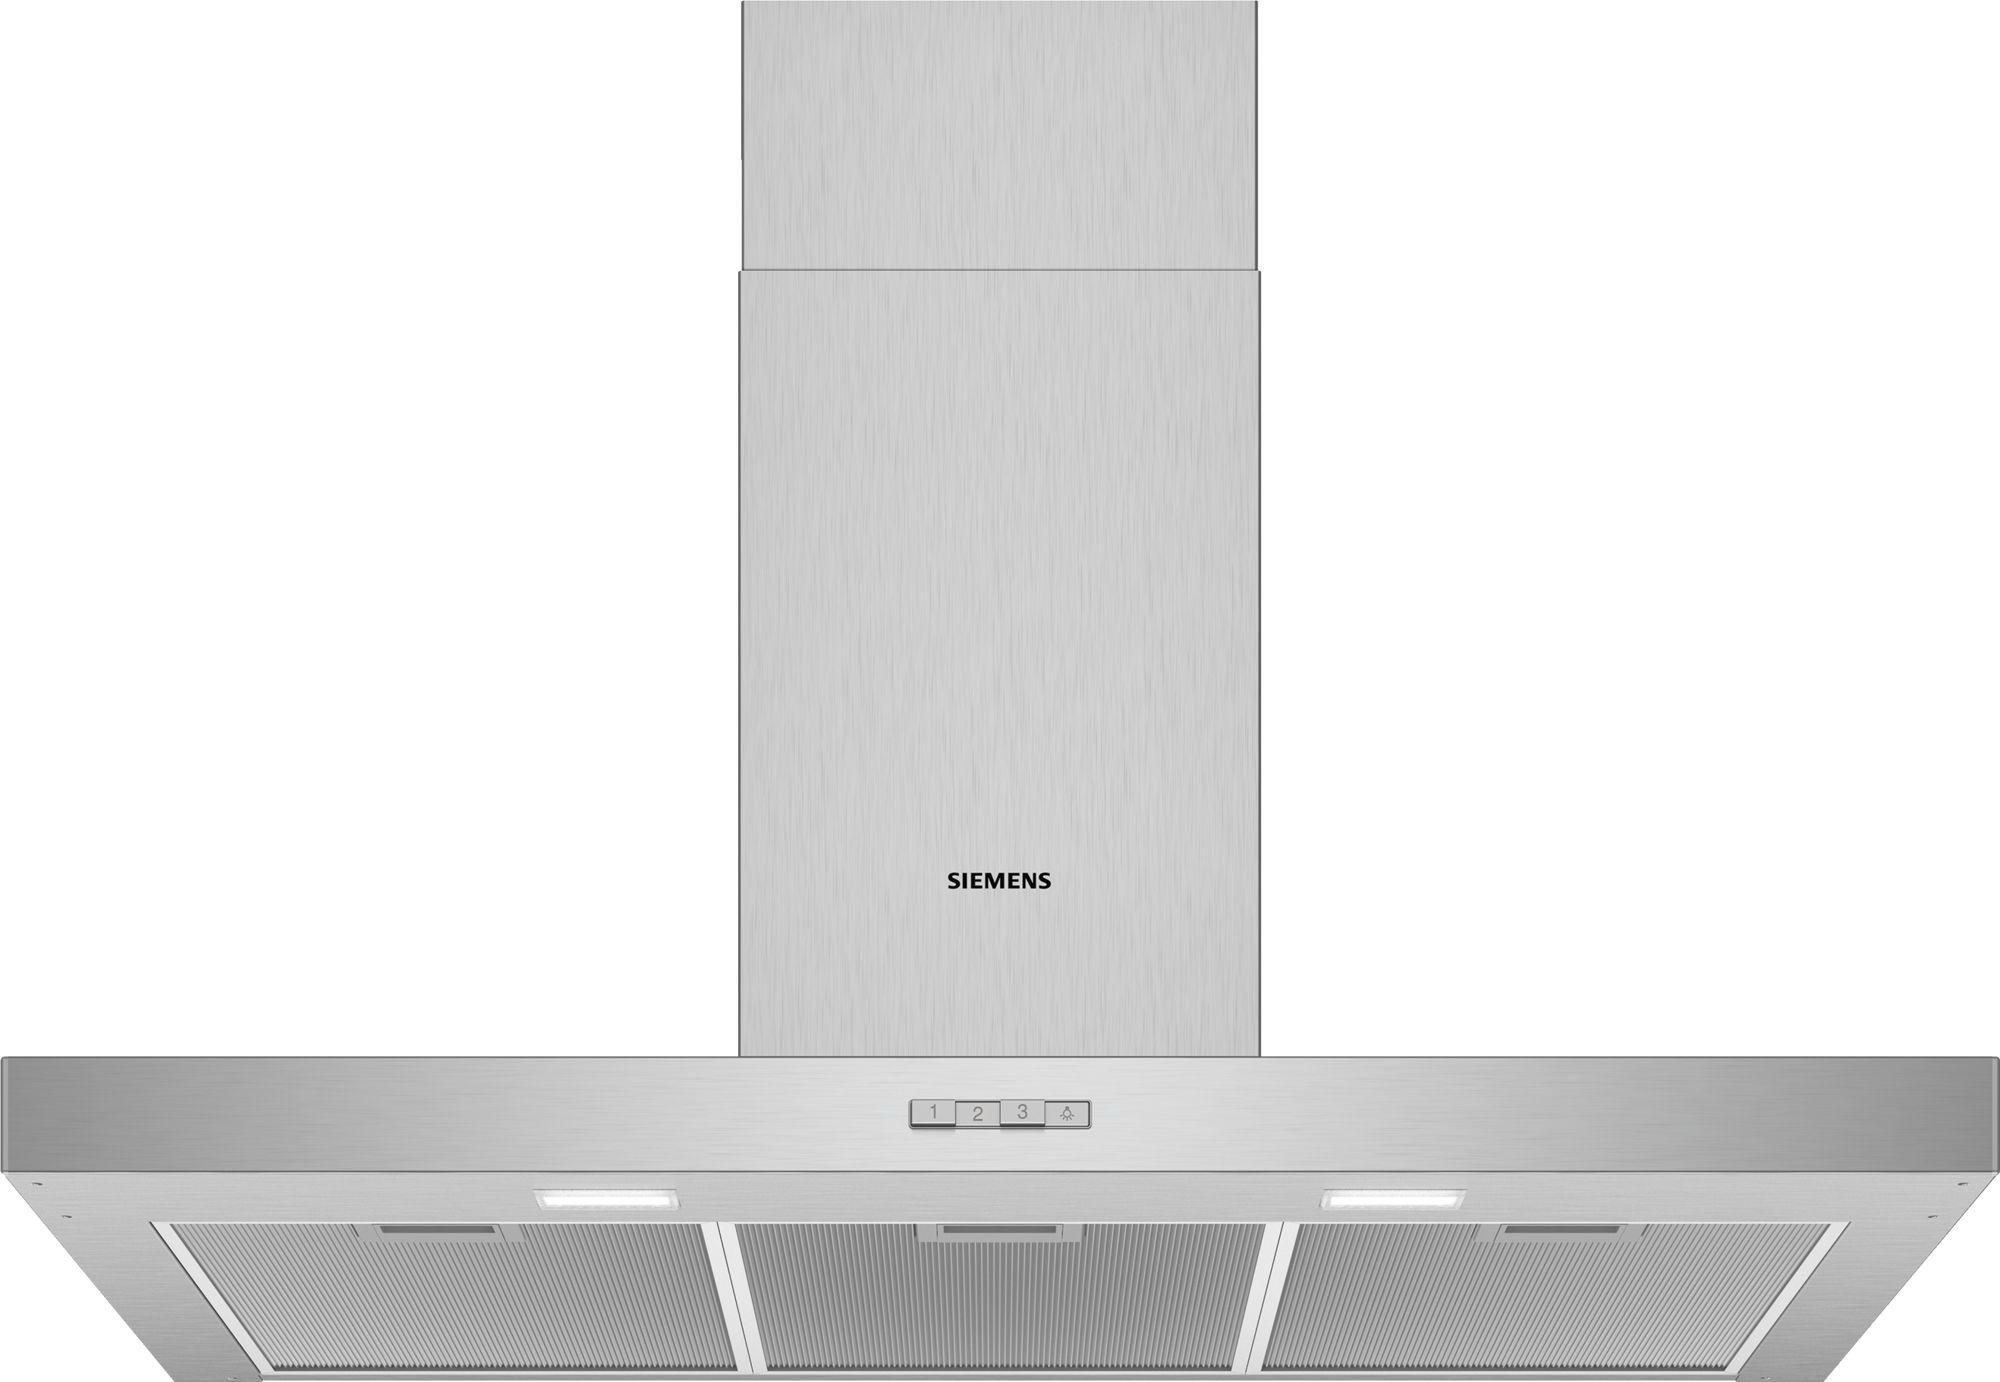 Siemens lc94bbc50 wandesse 90 cm wand hauben dunstabzugshauben kochen backen global - Wand dunstabzugshauben ...